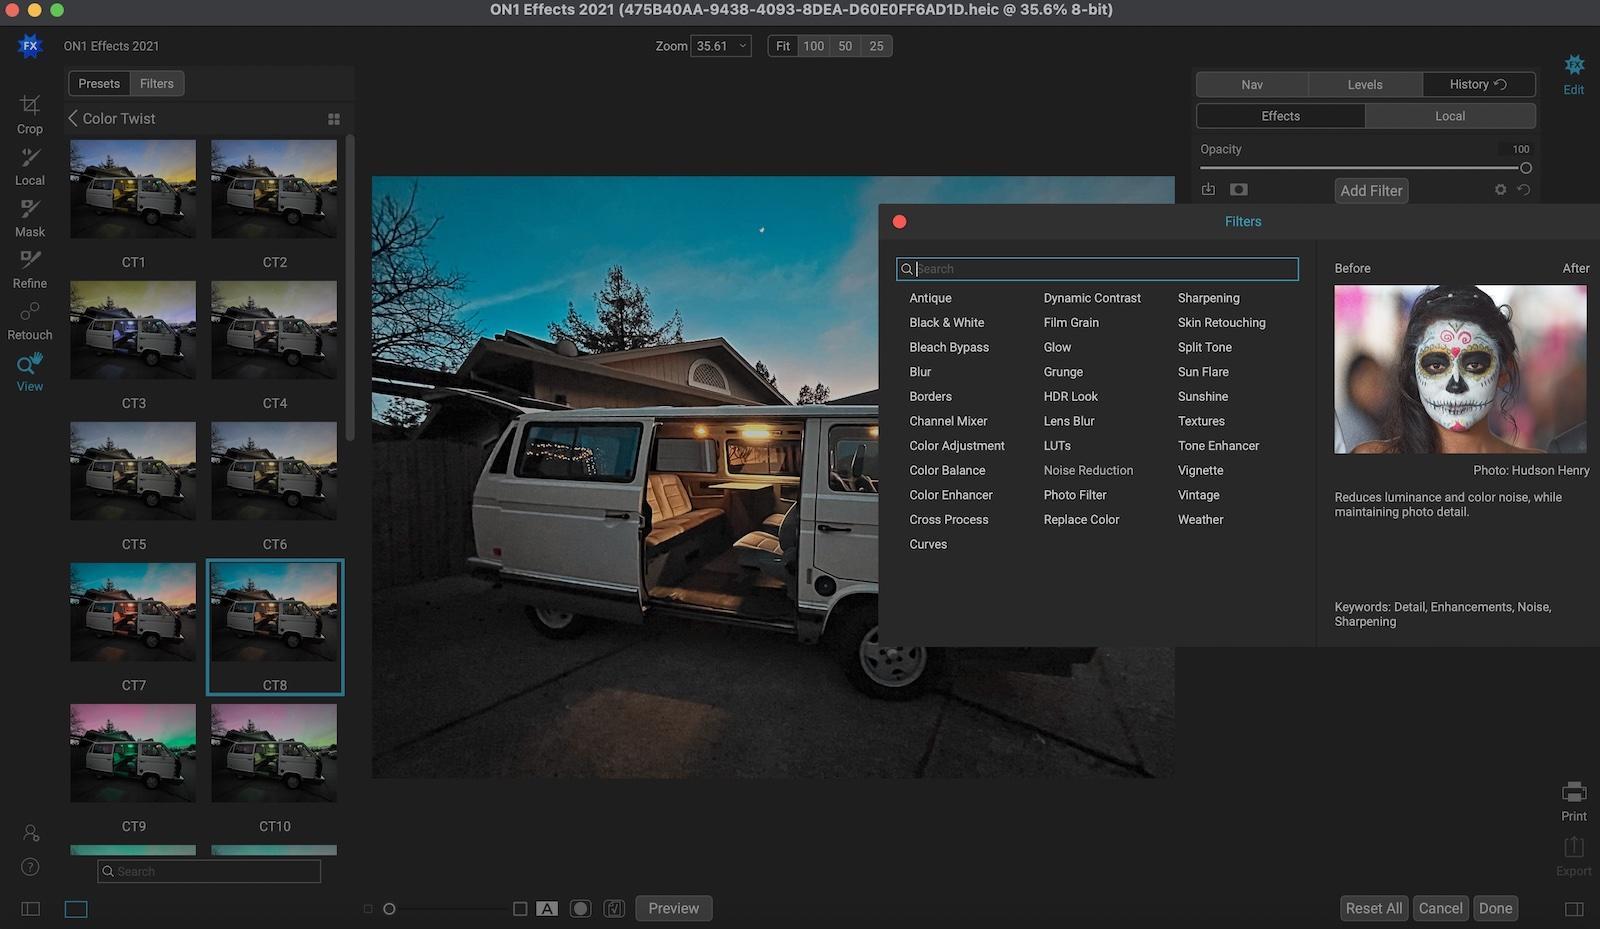 https://thedigitalstory.com/2021/05/08/003-Add-Filters.jpg